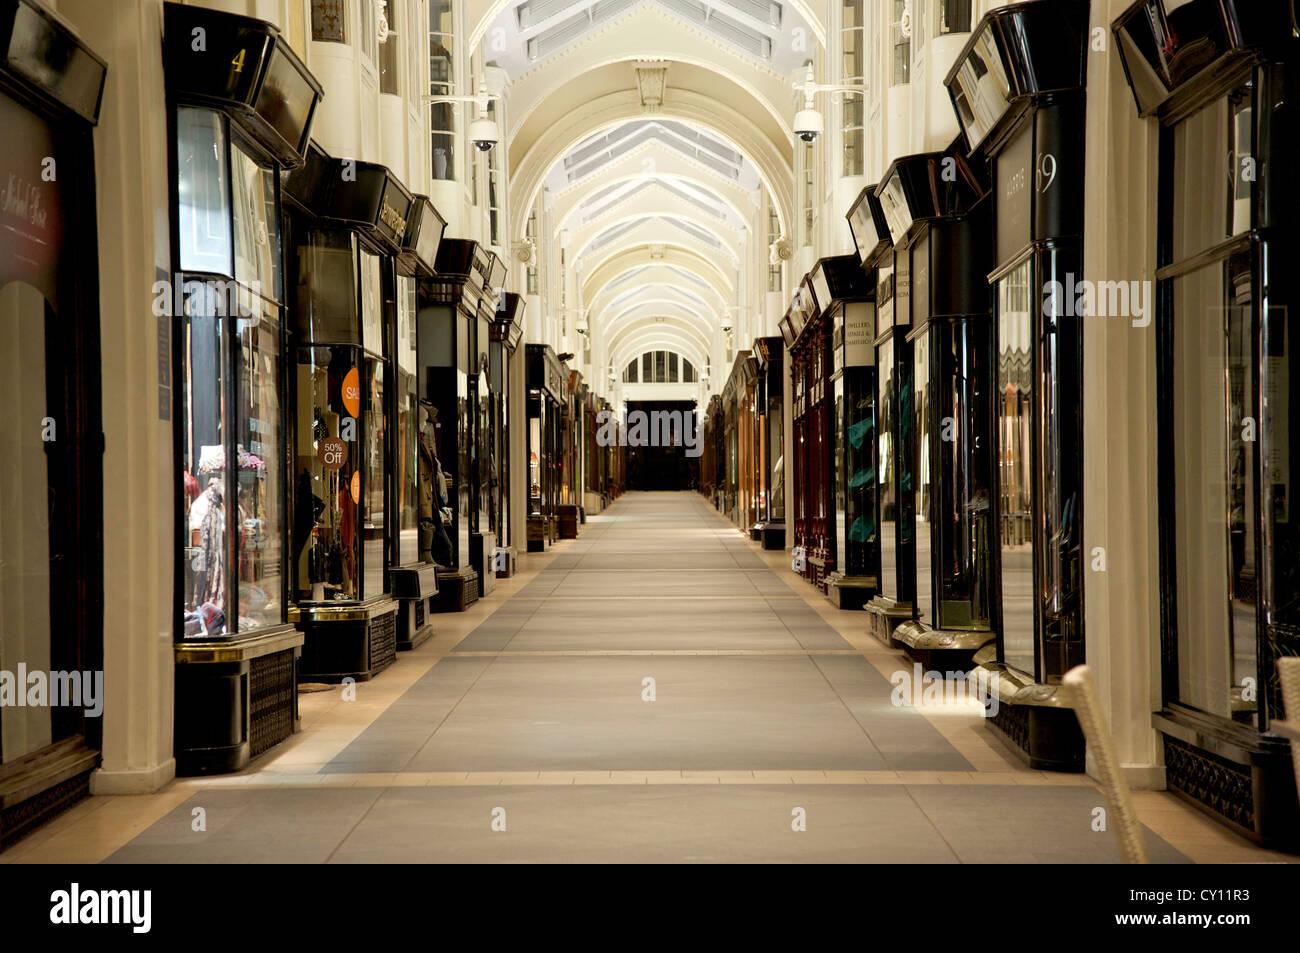 Burlington arcade Picadilly London - Stock Image